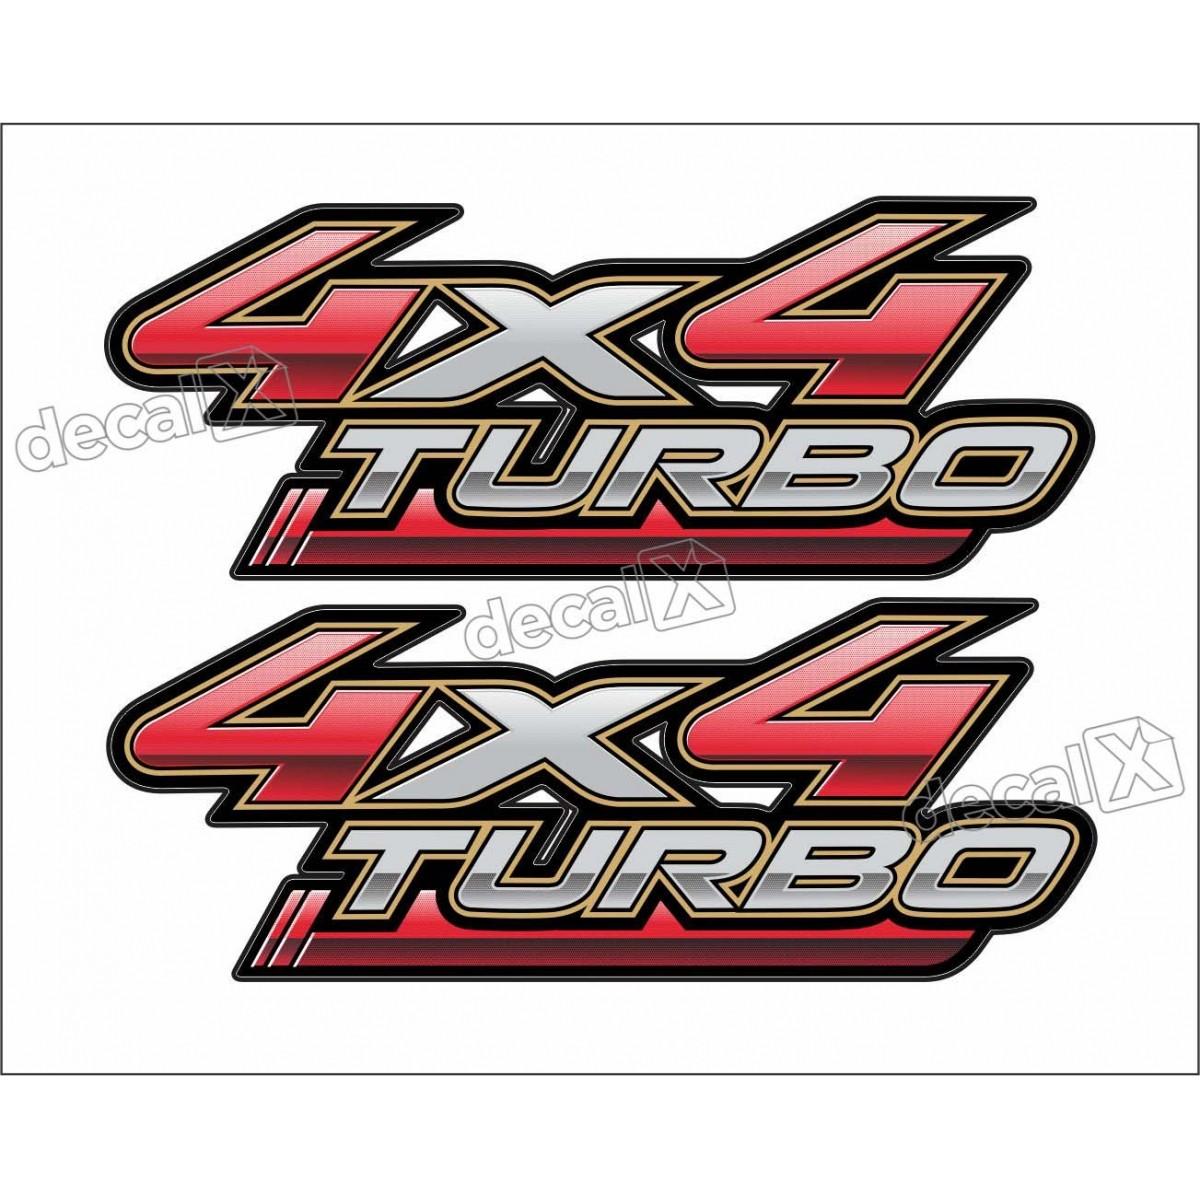 Adesivo Toyota Hilux 4x4 Turbo Par 2009 A 2012 Decalx